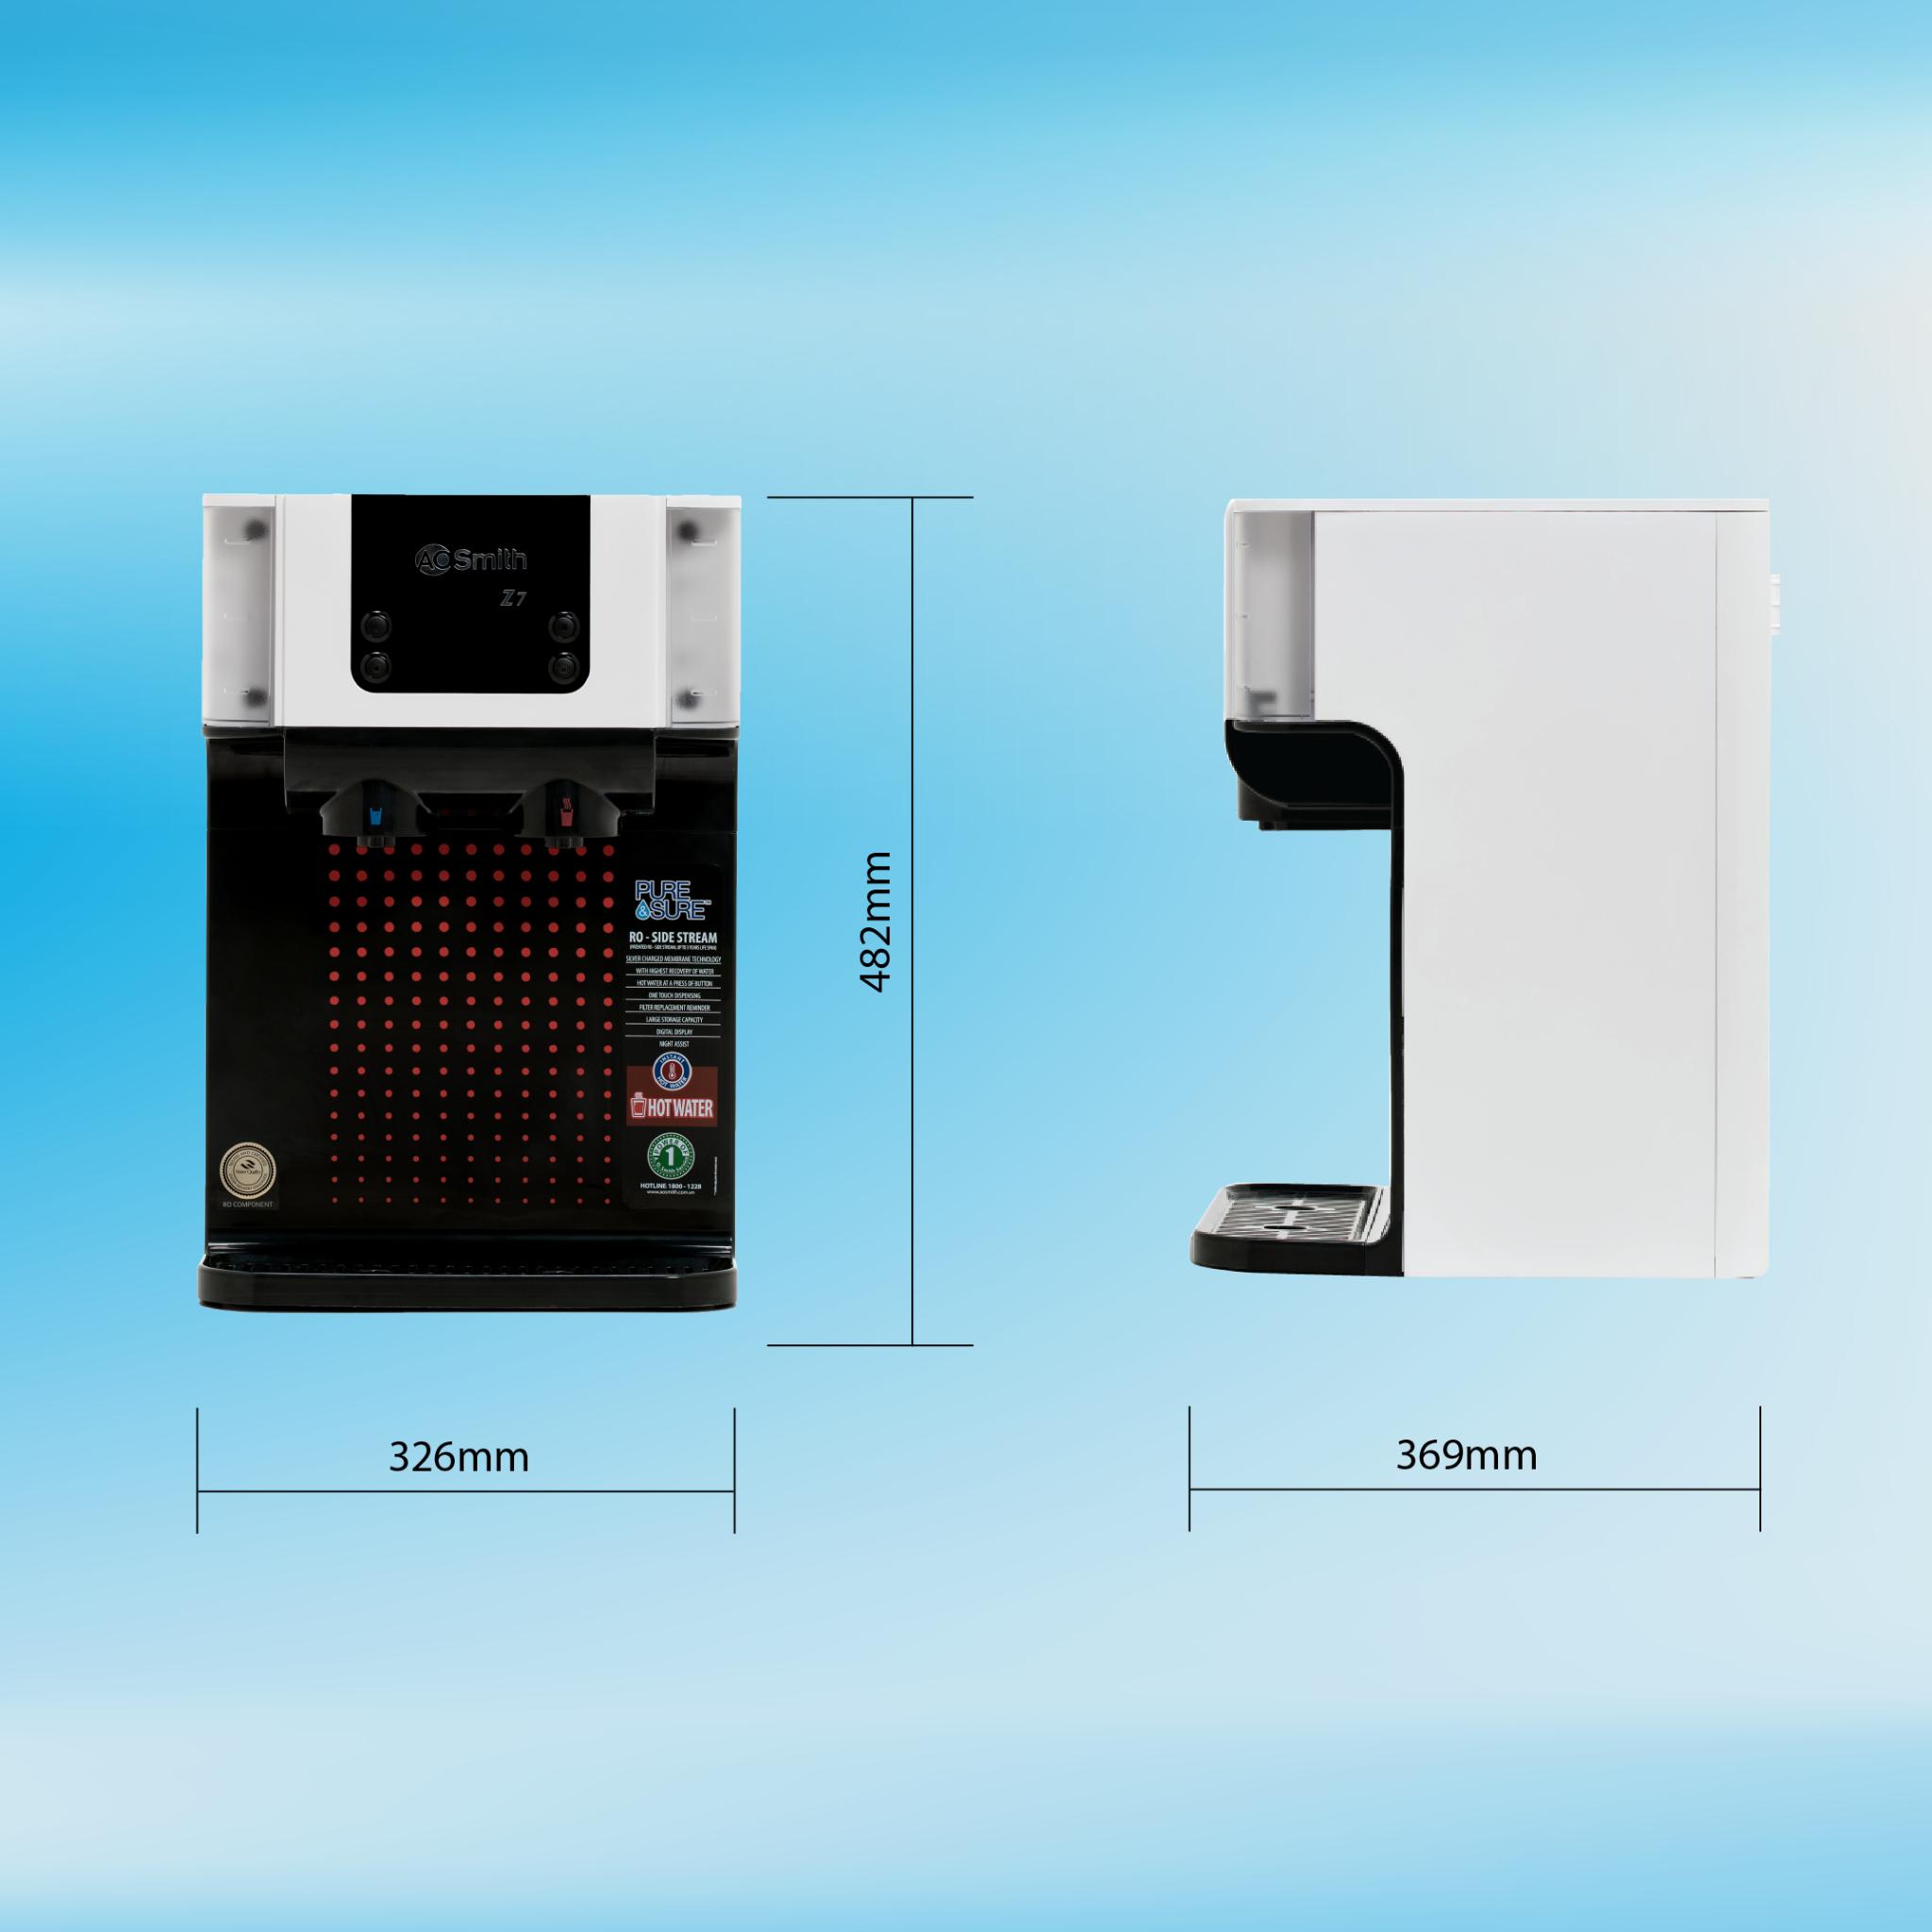 Máy lọc nước thường-nóng A.O.Smith RO-SIDE STREAM Z7 16